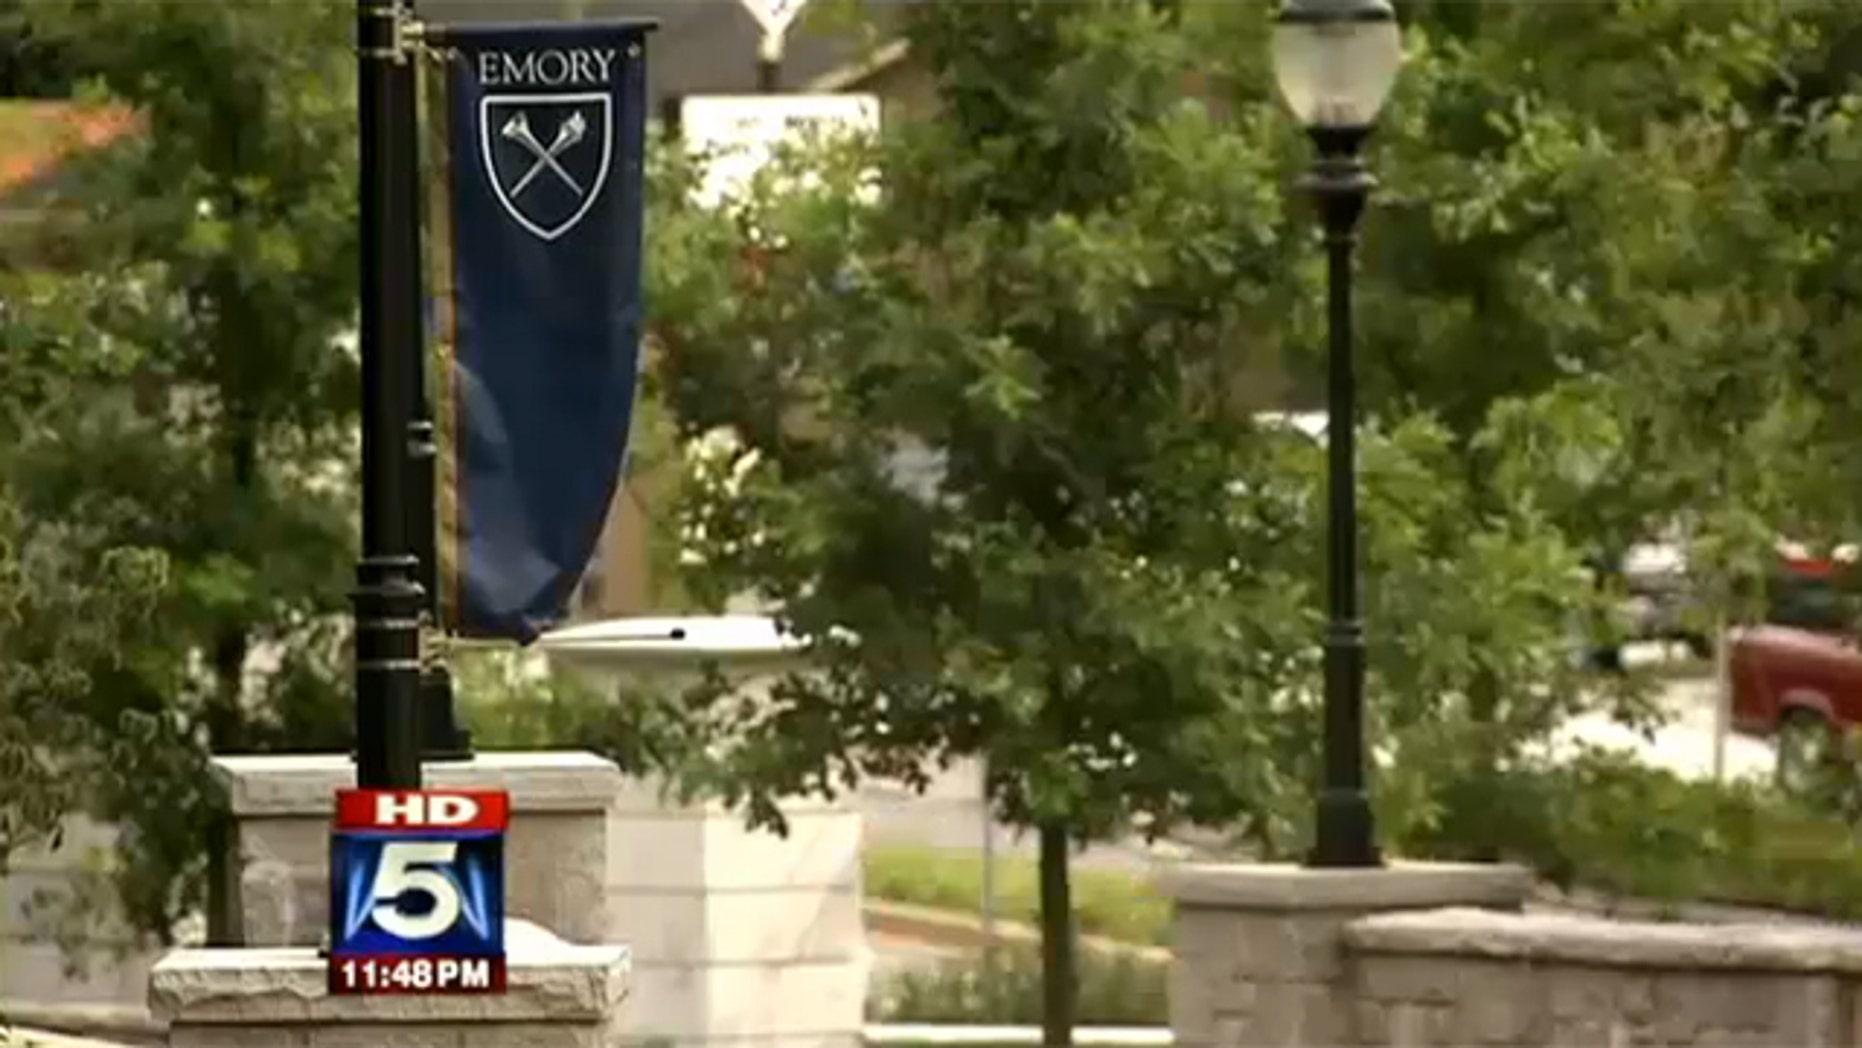 The Emory University campus in Atlanta.